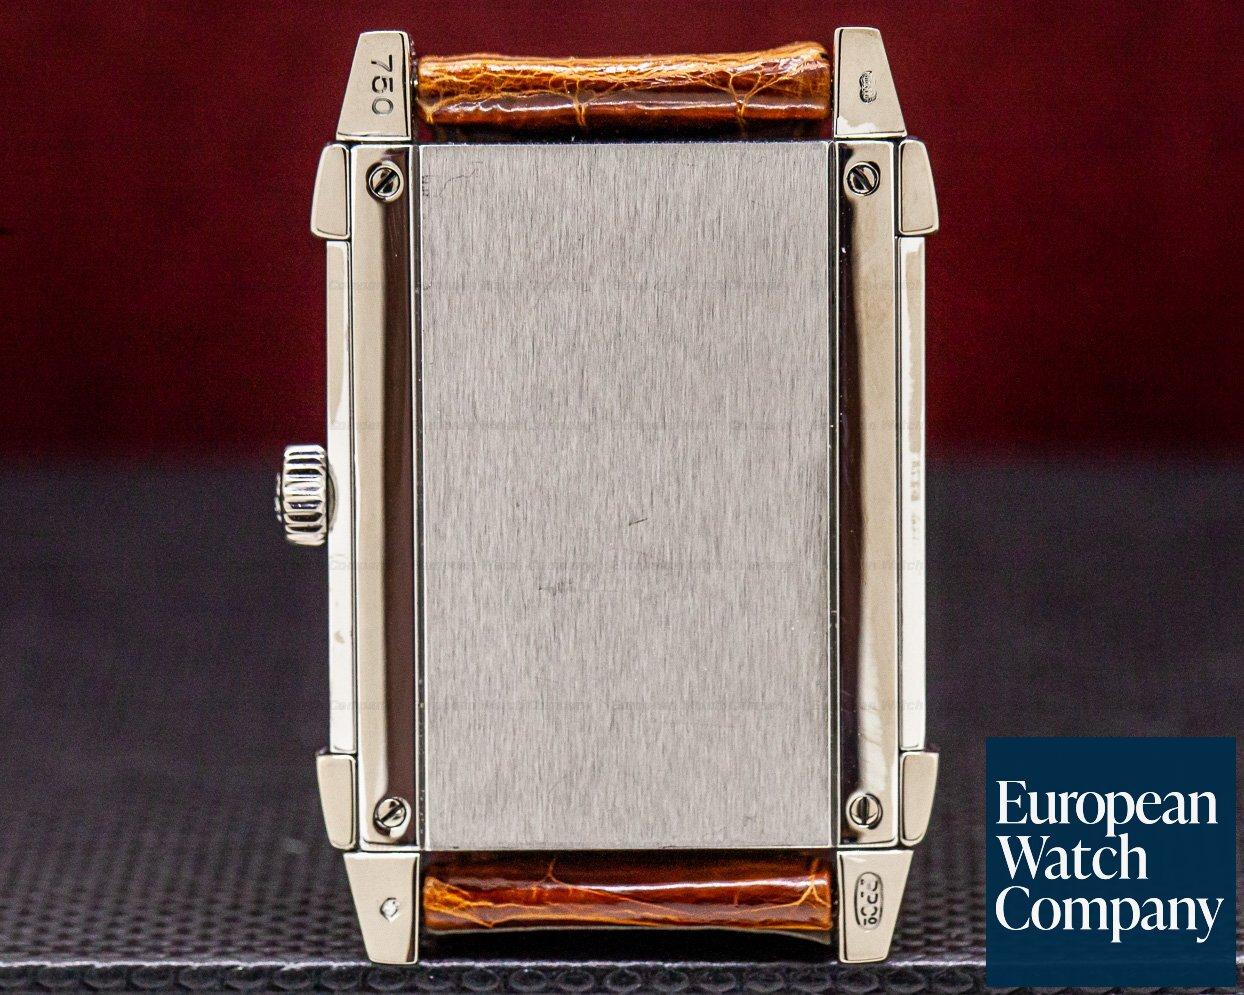 Patek Philippe 5111G-001 Gondolo Manual Wind 18K White Gold